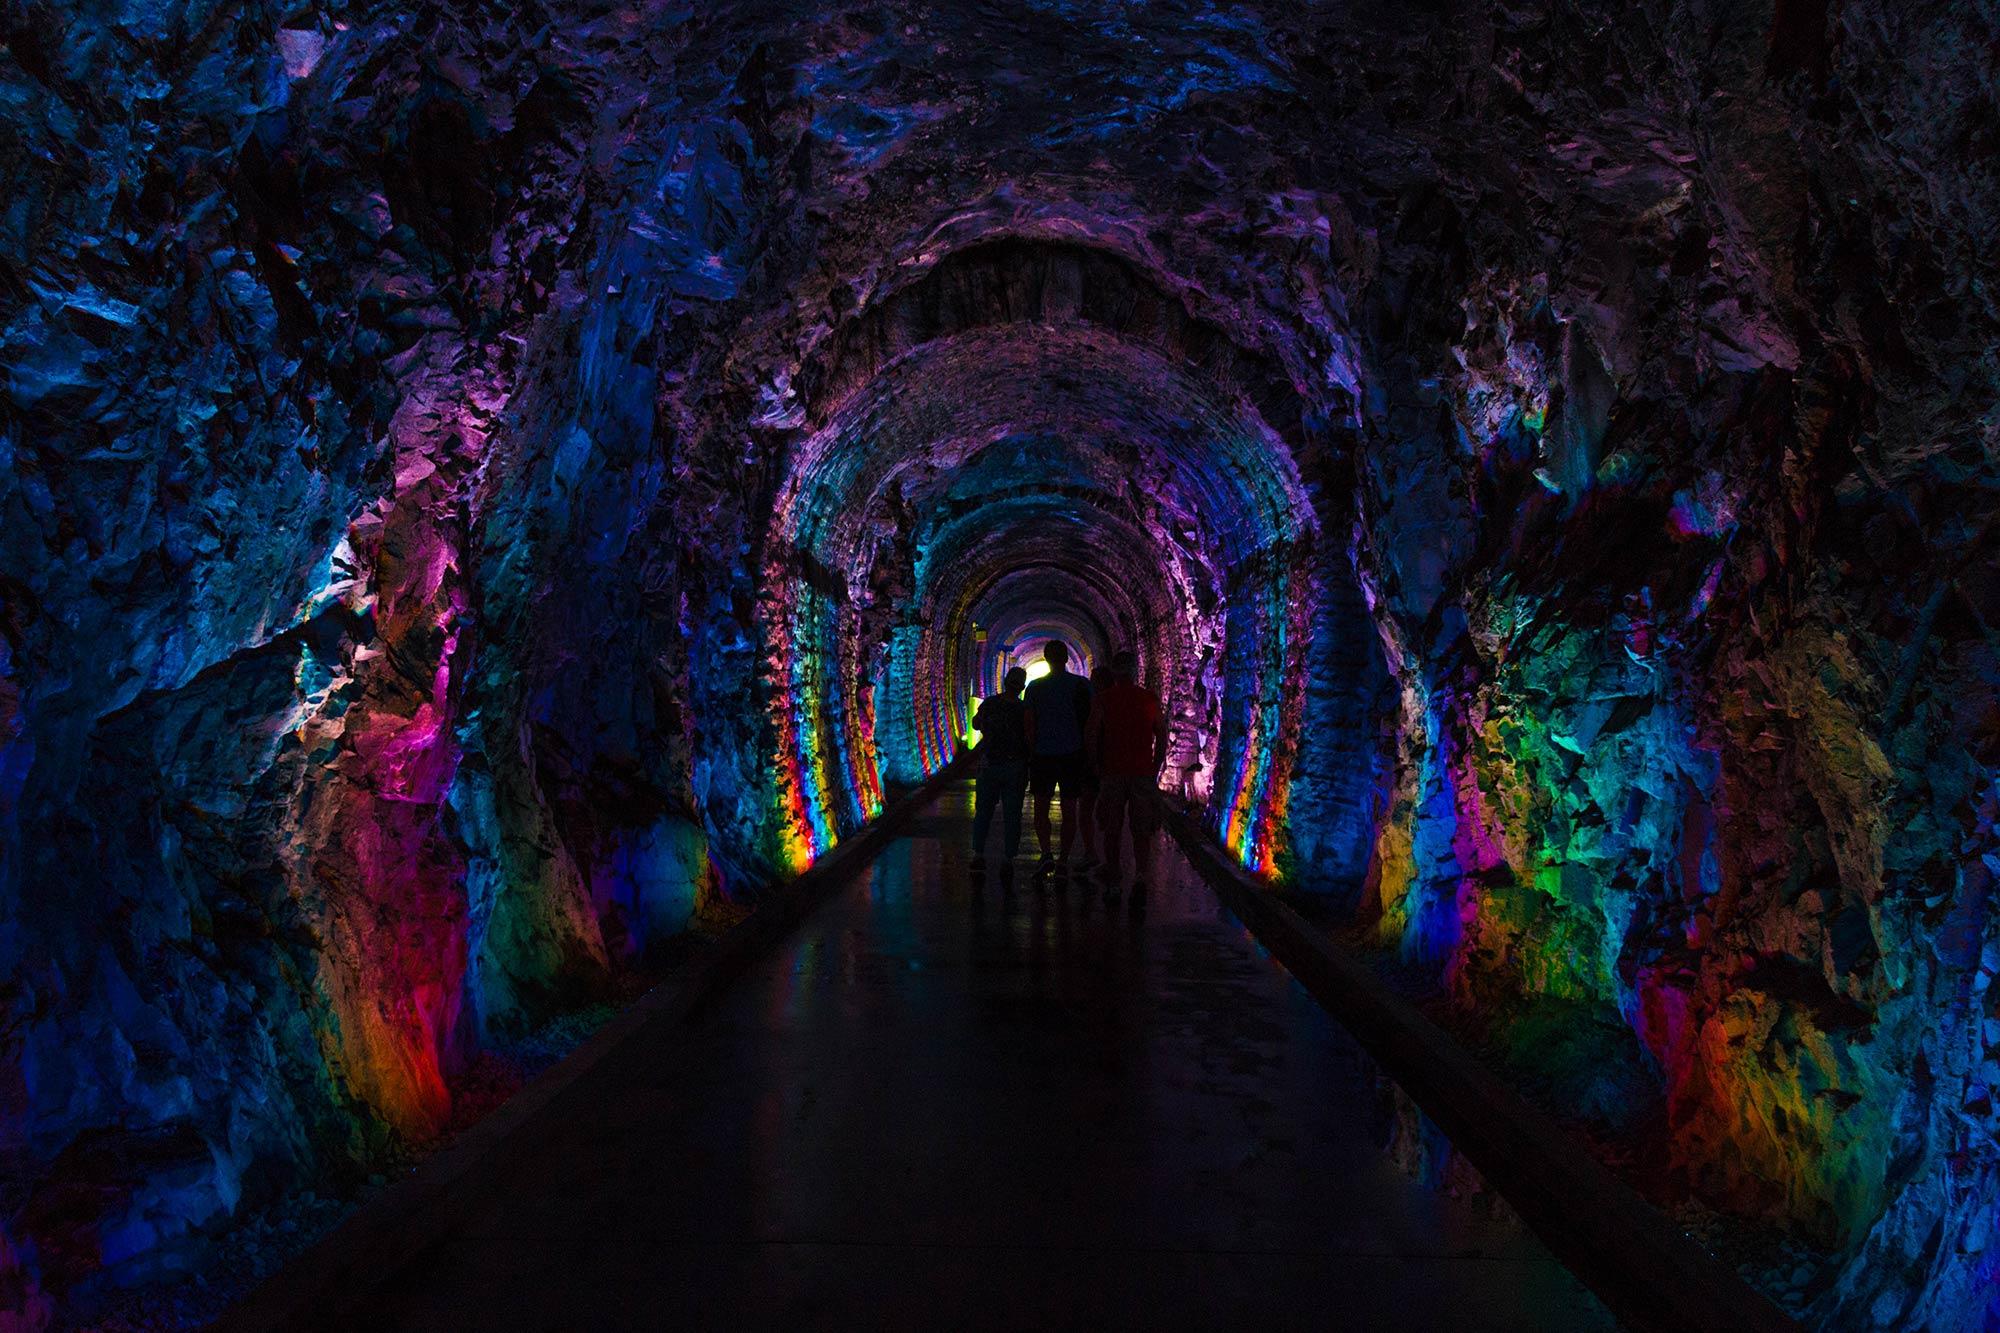 The Rainbow Multicoloured Railway Tunnel In Brockville, Ontario, Canada